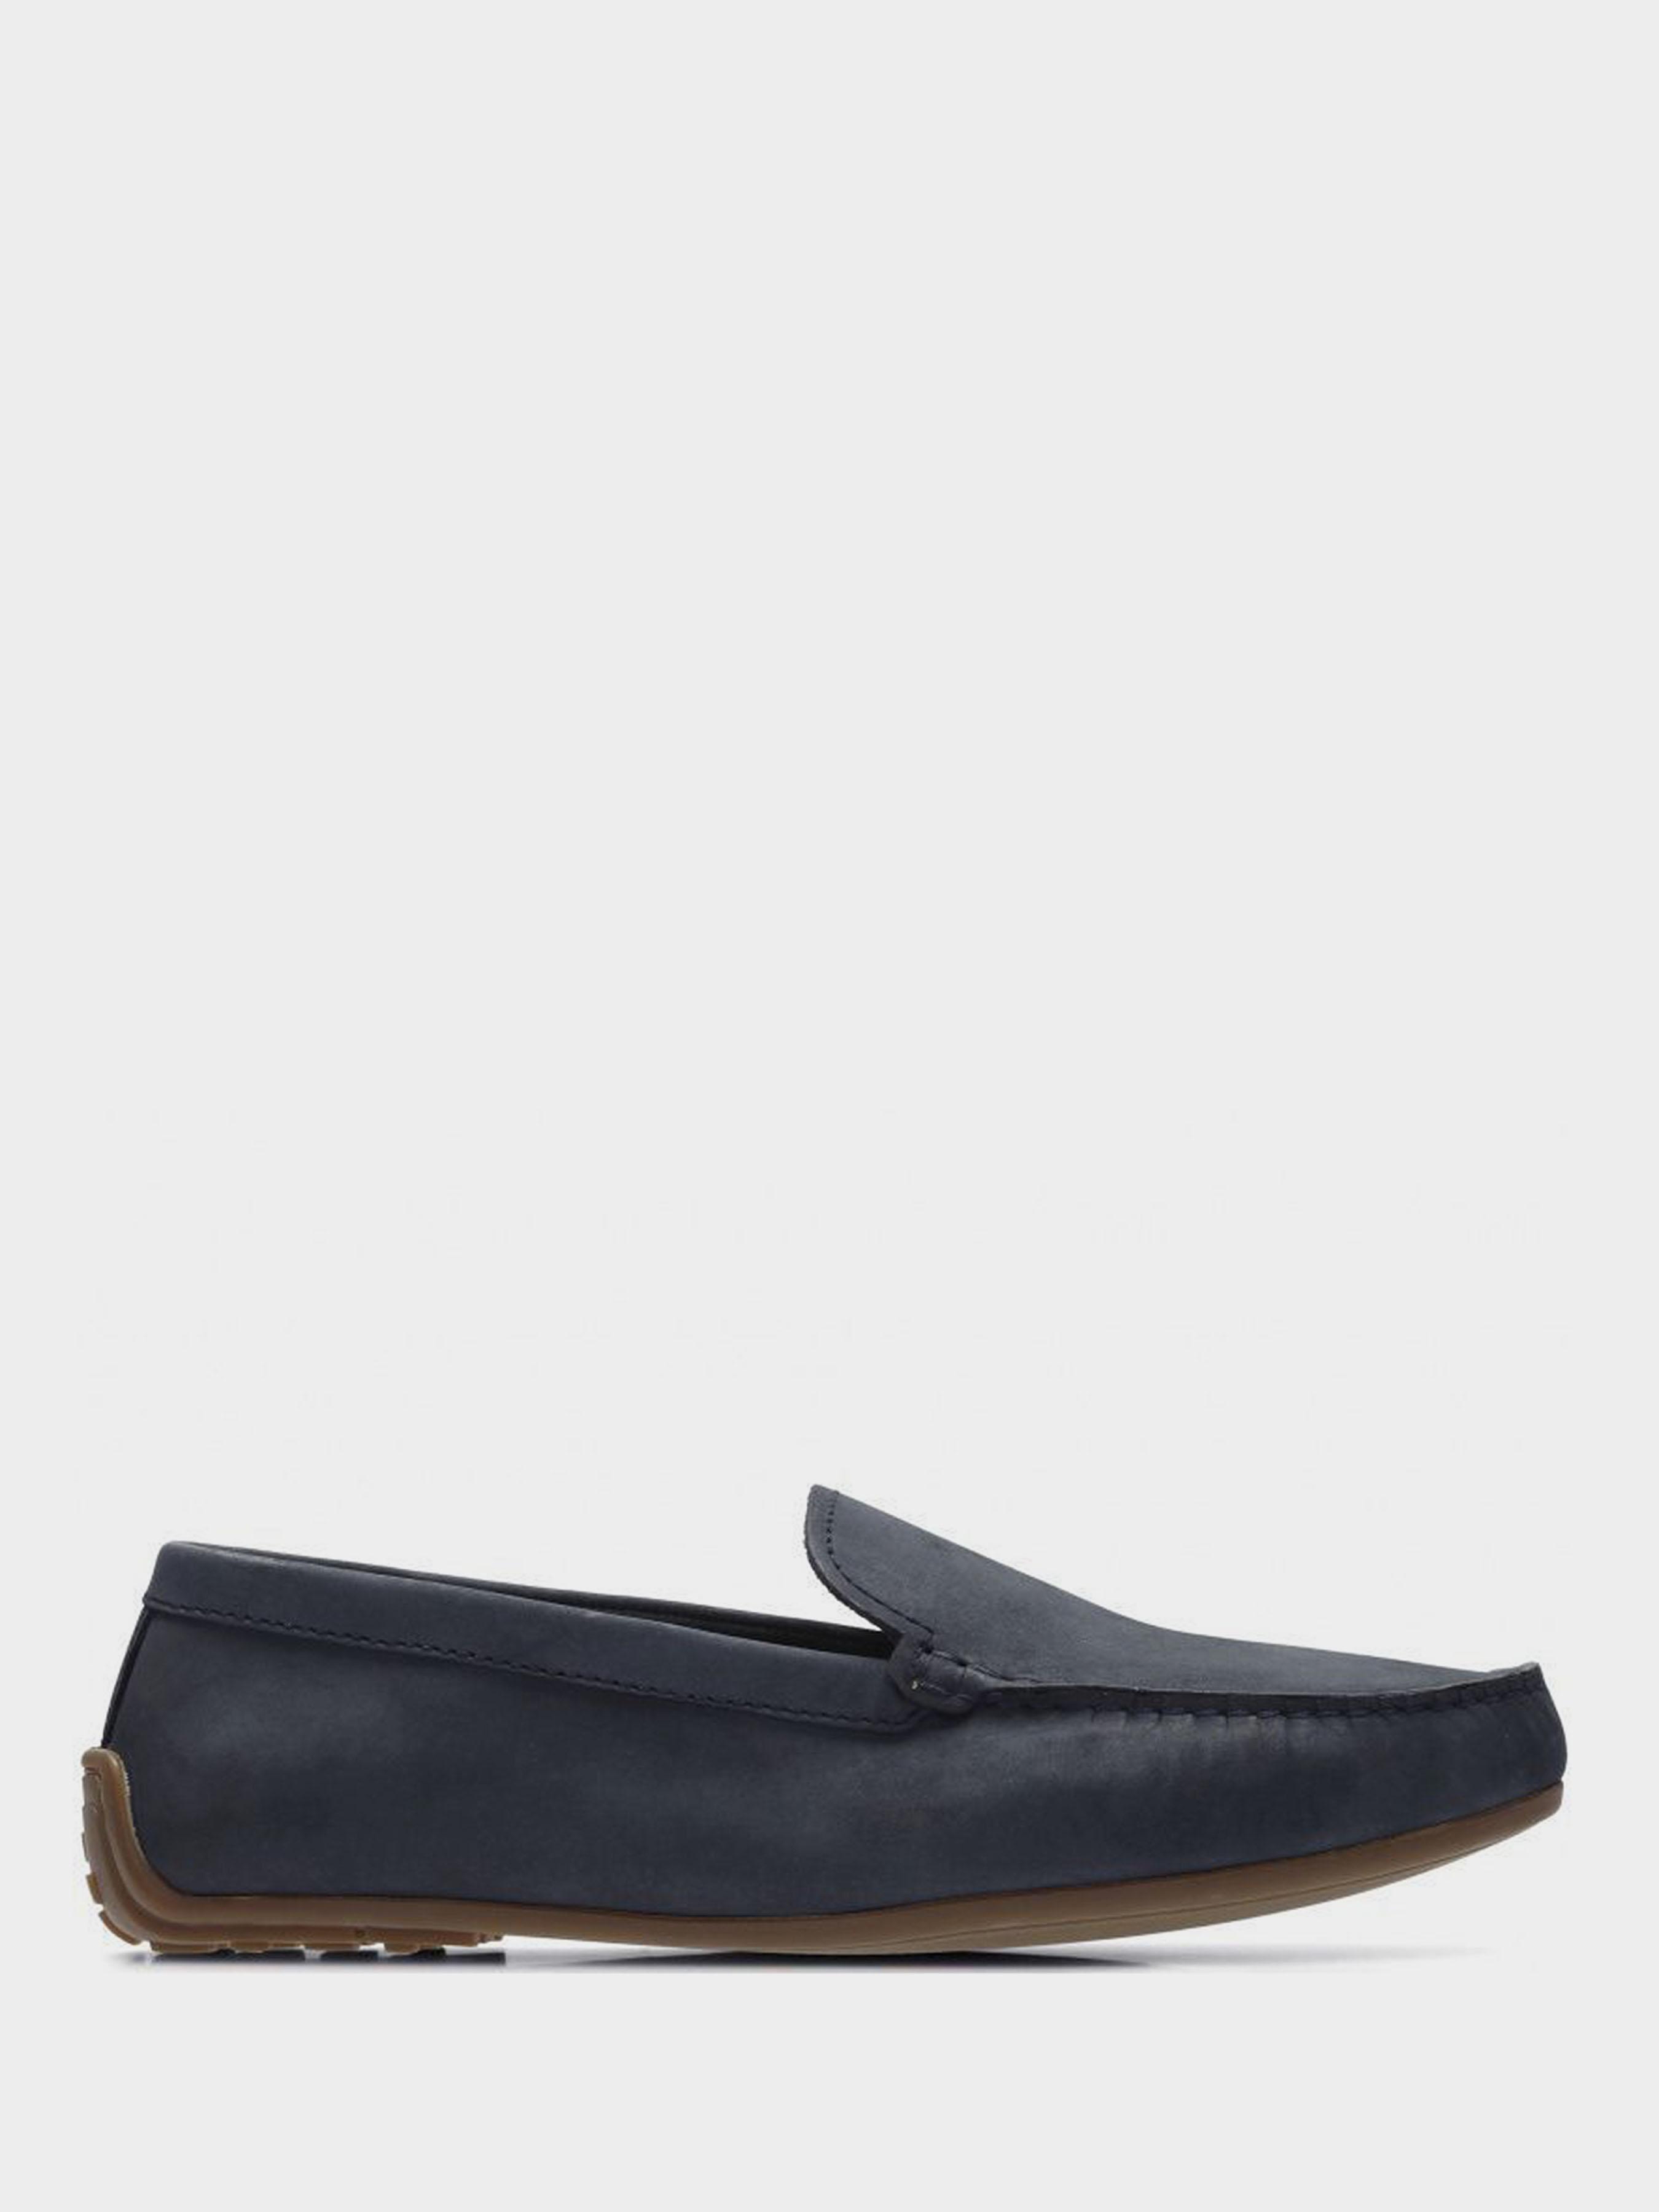 Мокасины мужские Clarks Reazor Edge OM2850 размеры обуви, 2017